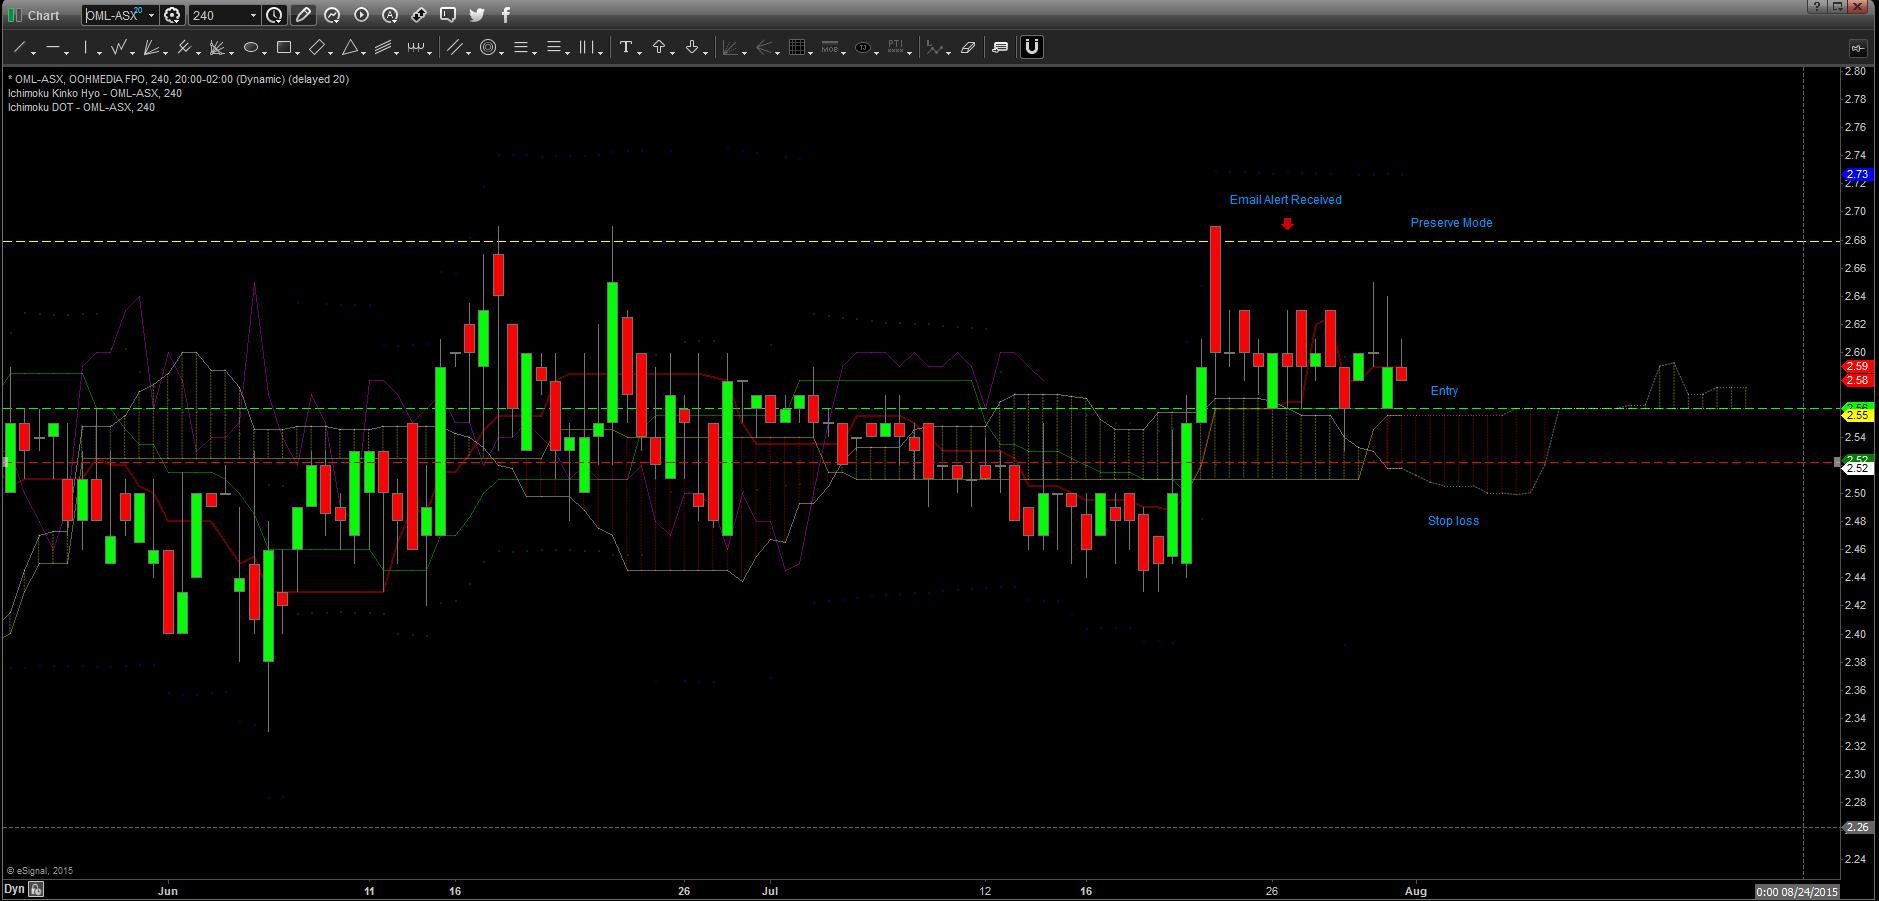 OML-ASX 240M chart